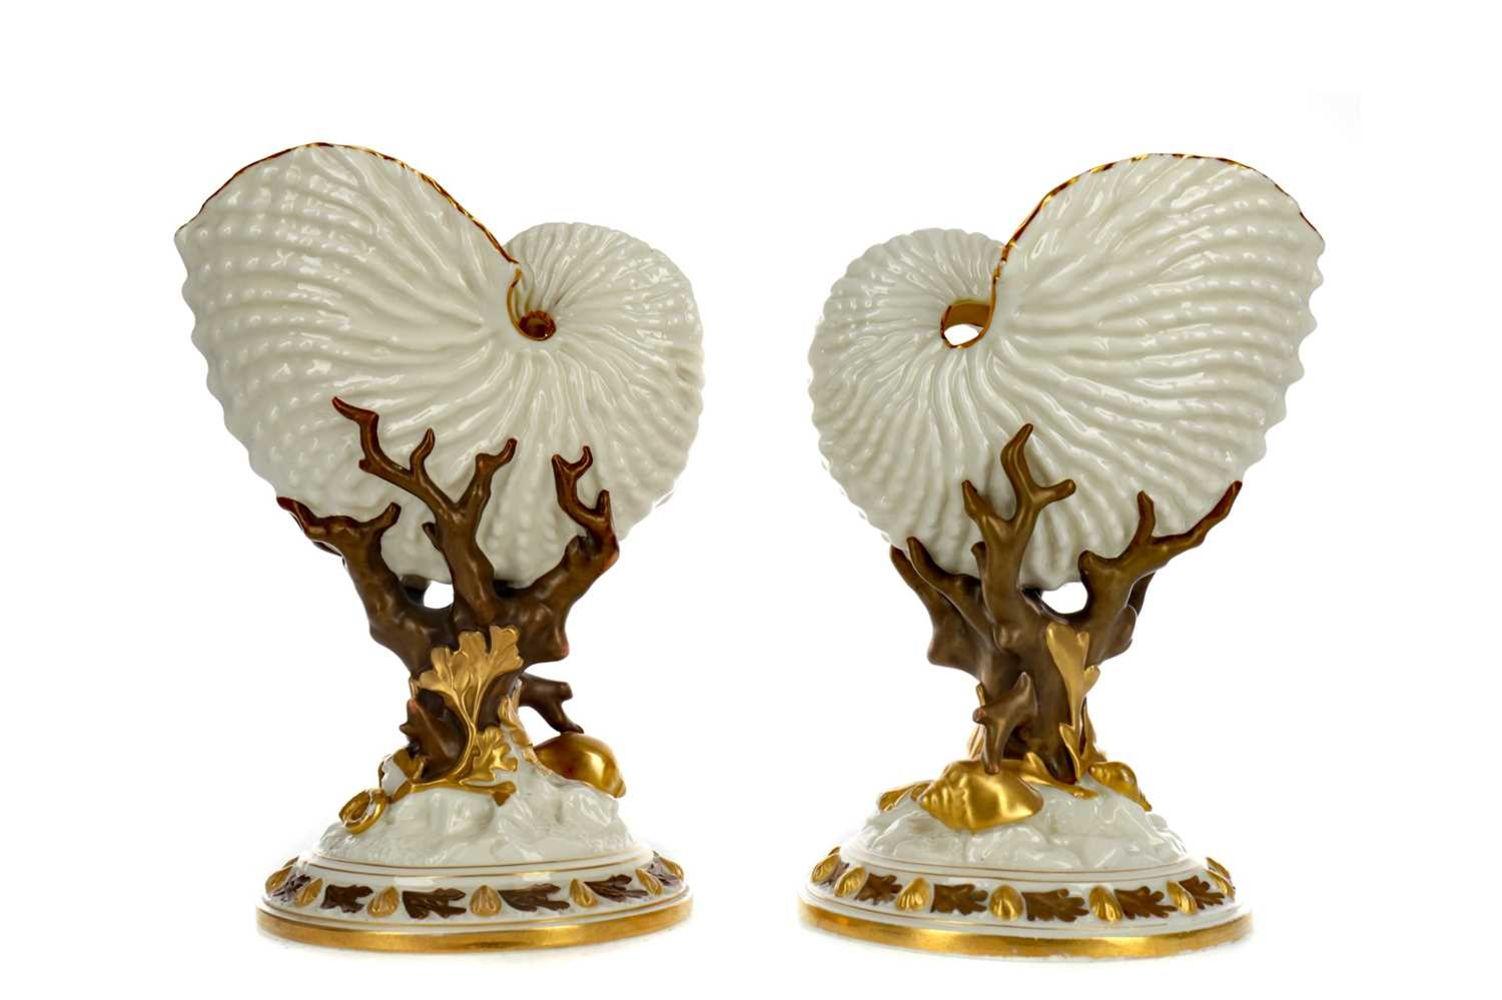 The British & Continental Ceramics & Glass Auction